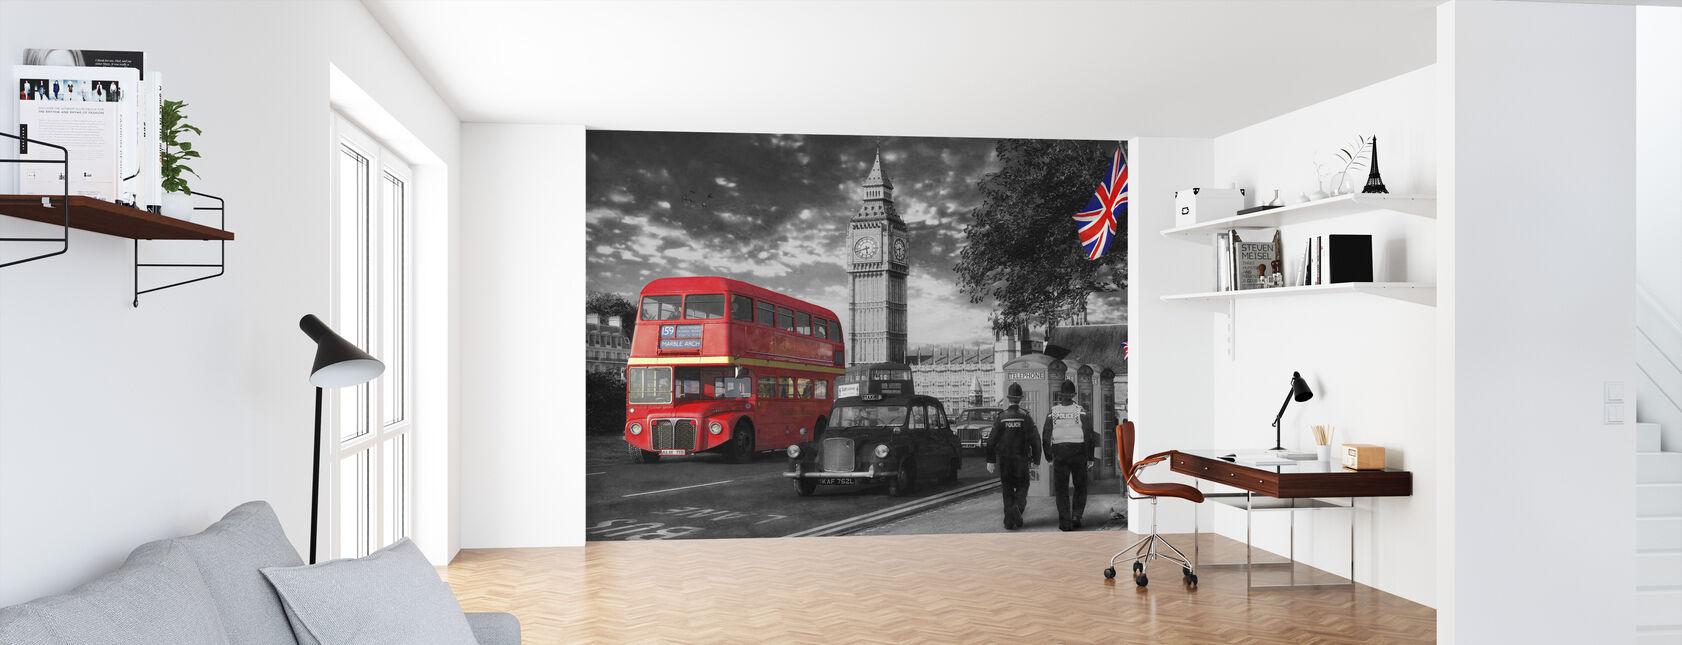 Parliament Square - Wallpaper - Office